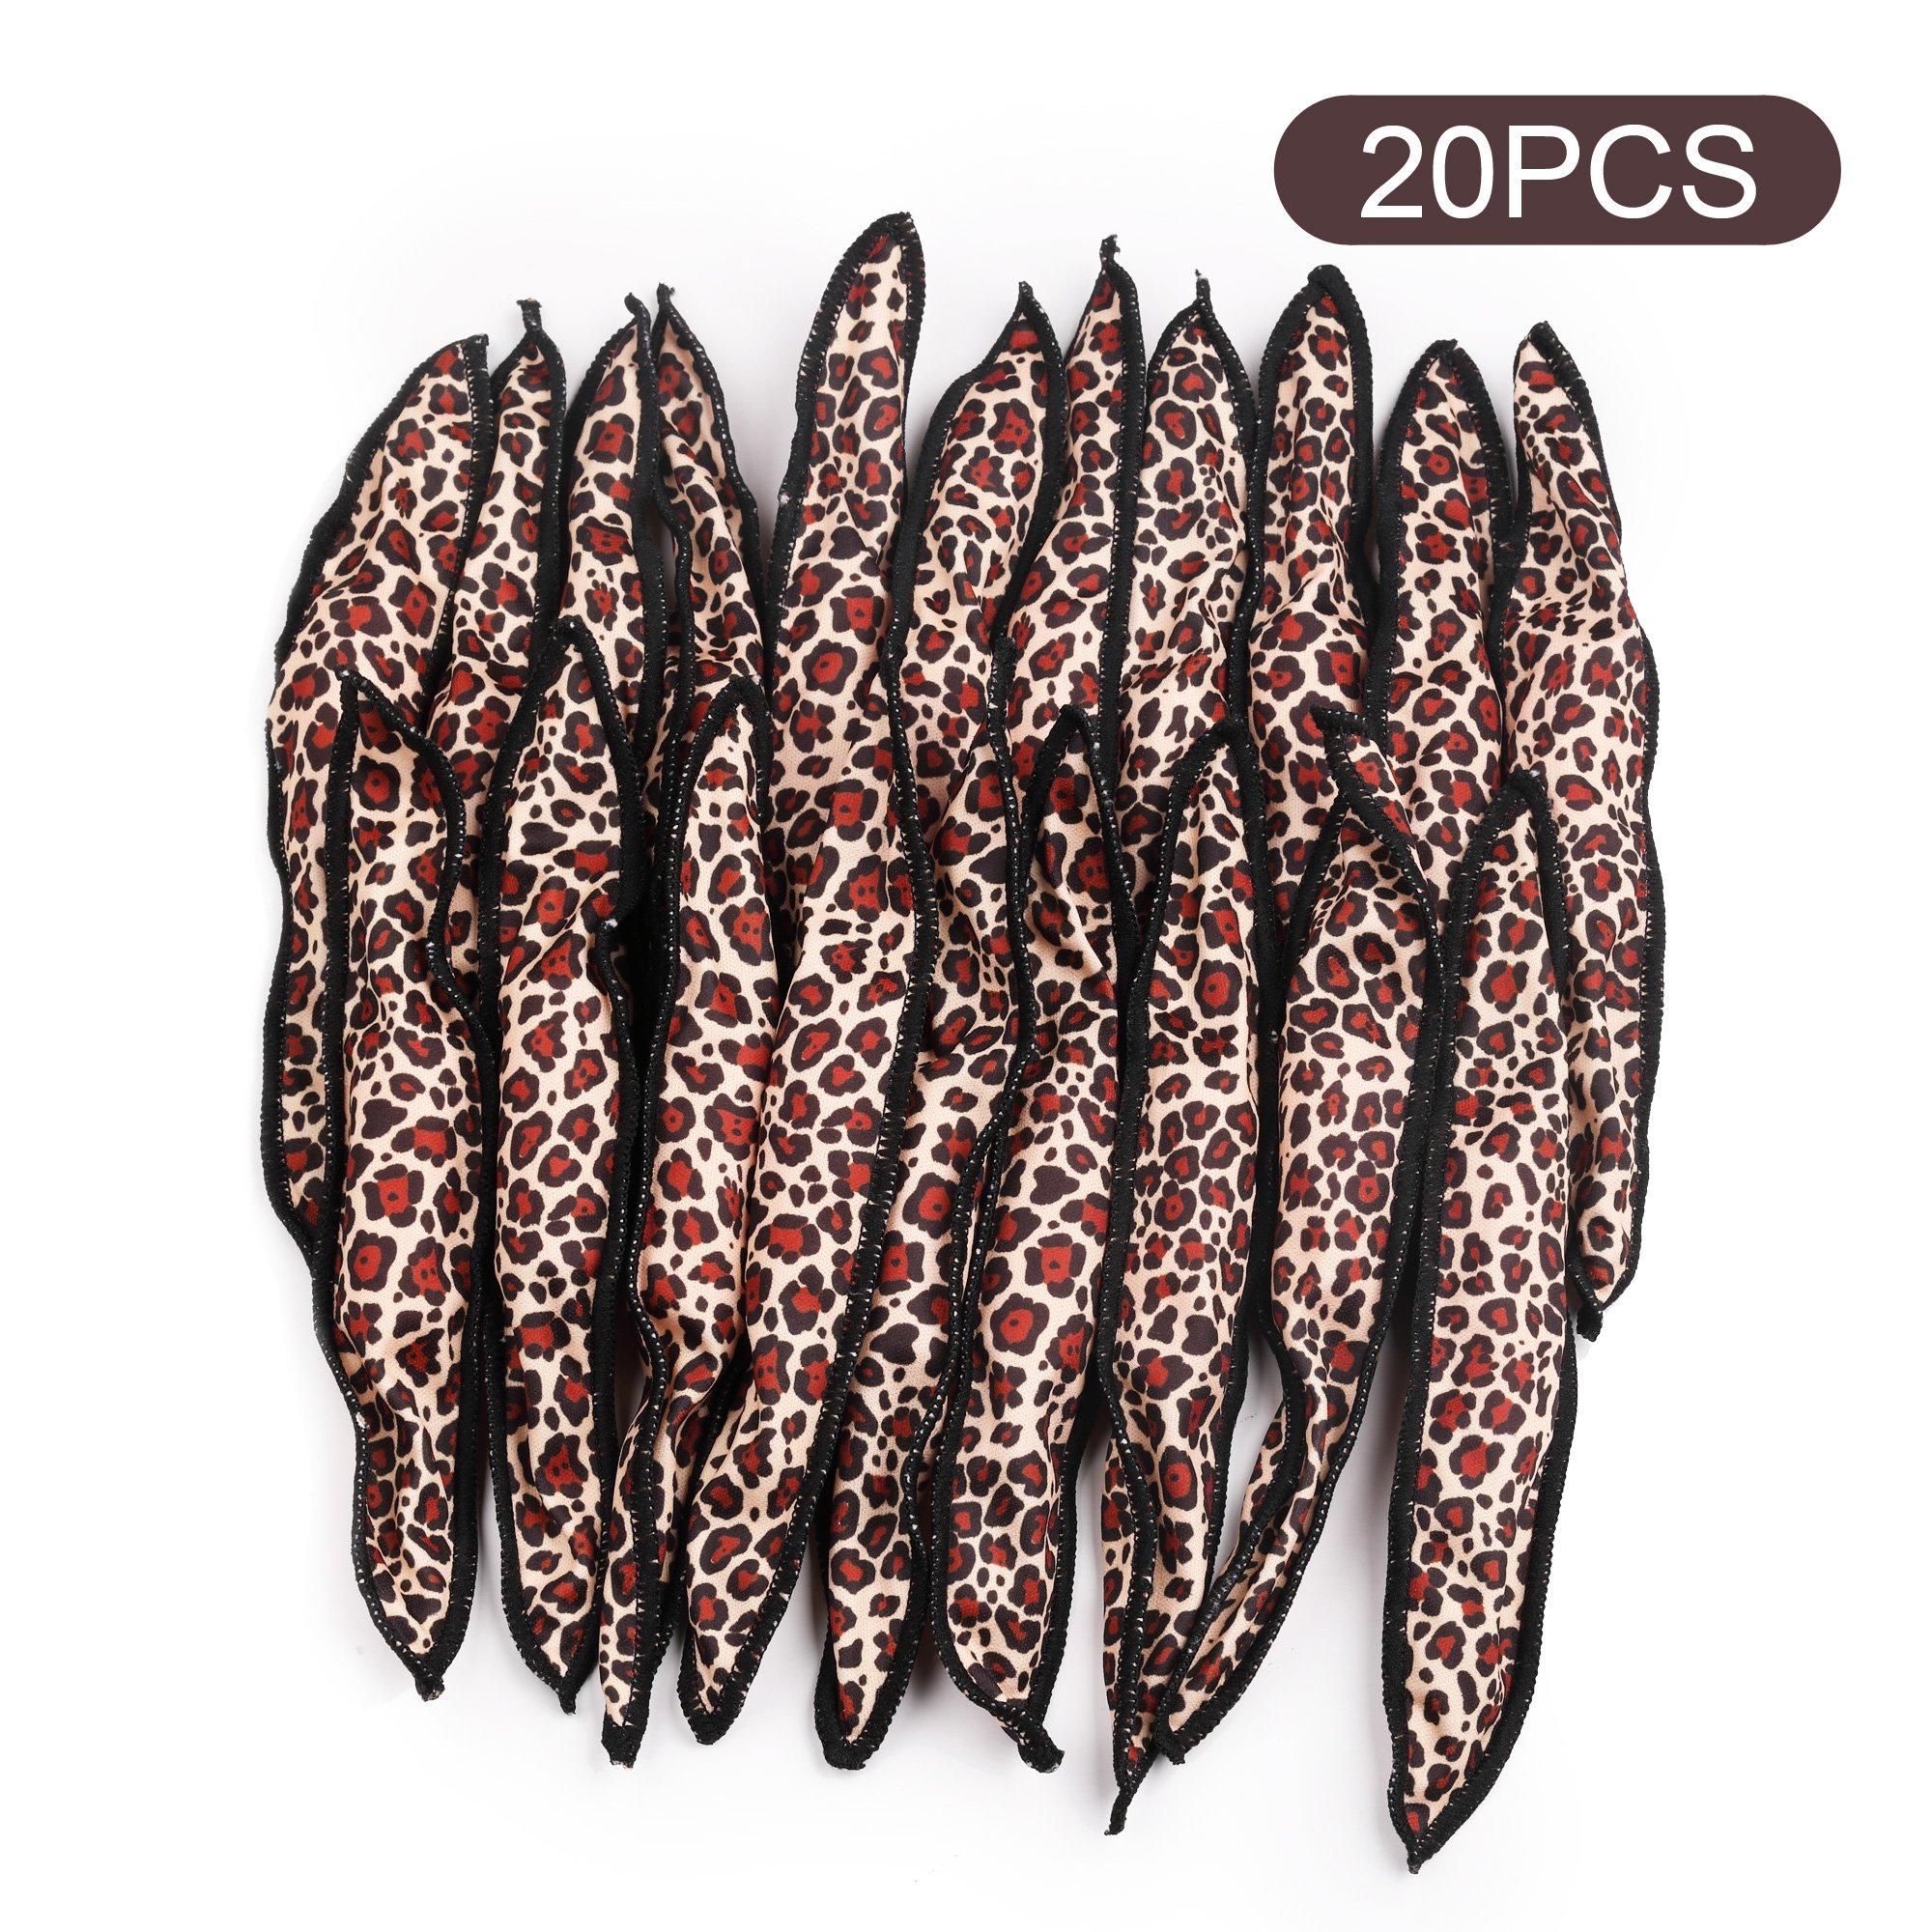 Black egg hair curlers 20pcs night sleep foam hair rollers leopard print DIY hair tools no heat and safe for women&kids